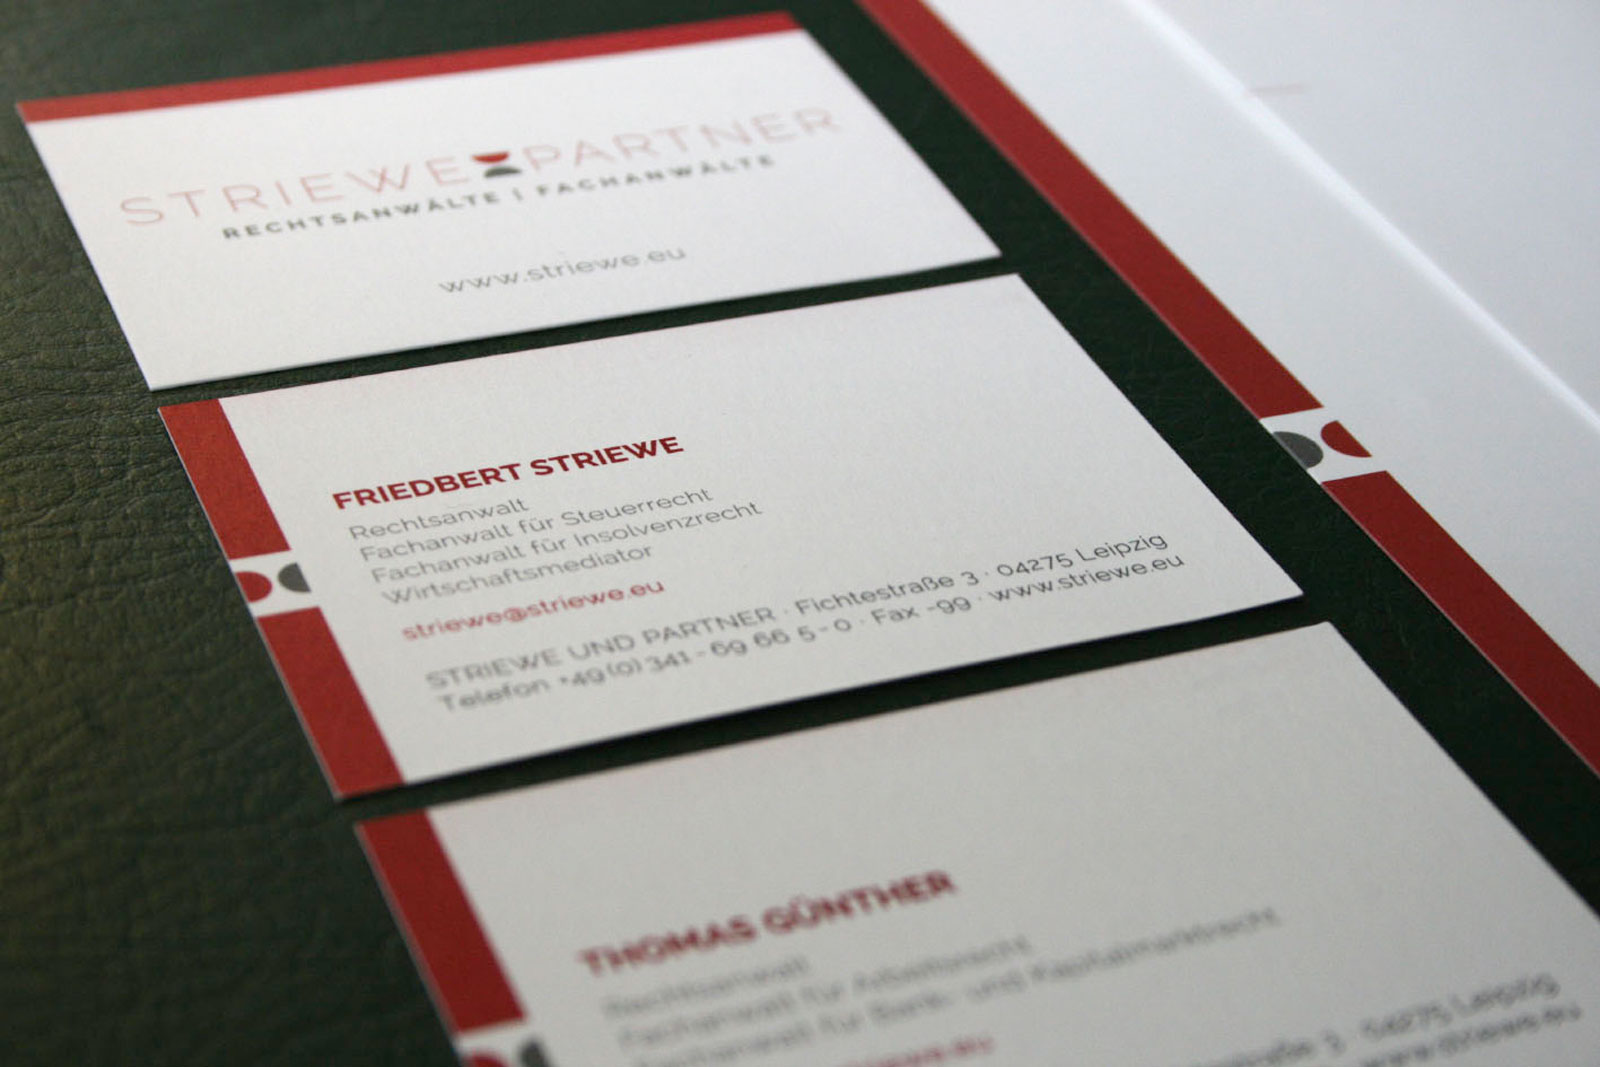 kathrin, krasselt, mediendesign, grafik, grafiker, leipzig, werbung, webdesign, logo, corporate, design, striewe, rechtsanwalt, visitenkarte